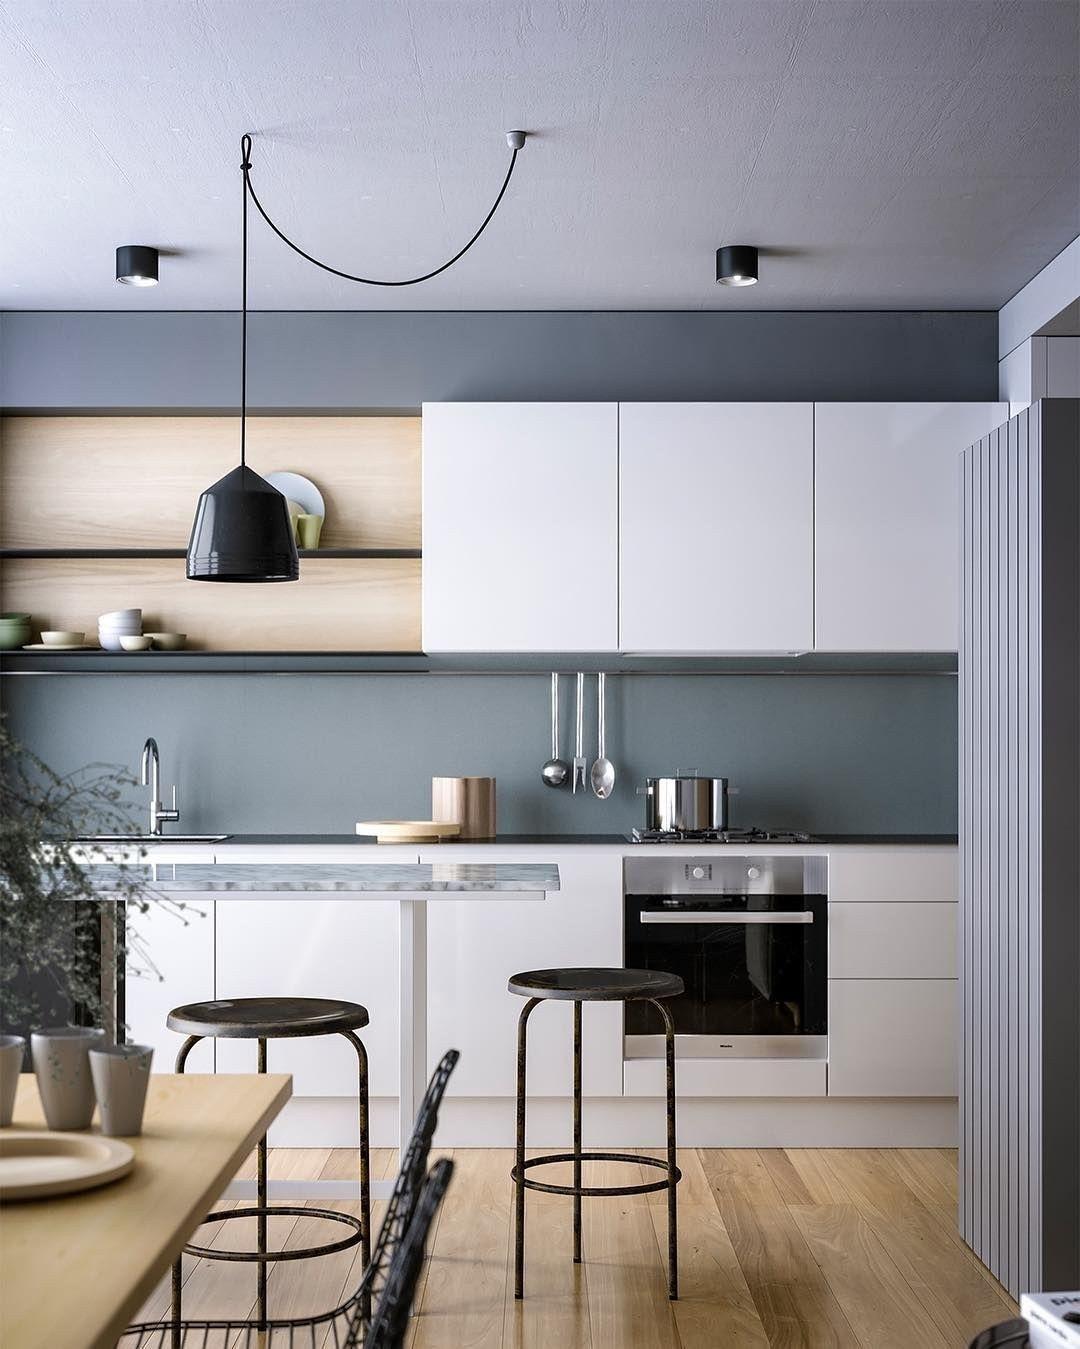 18 Awesome Modern Scandinavian Kitchen Ideas (18)  Kitchen